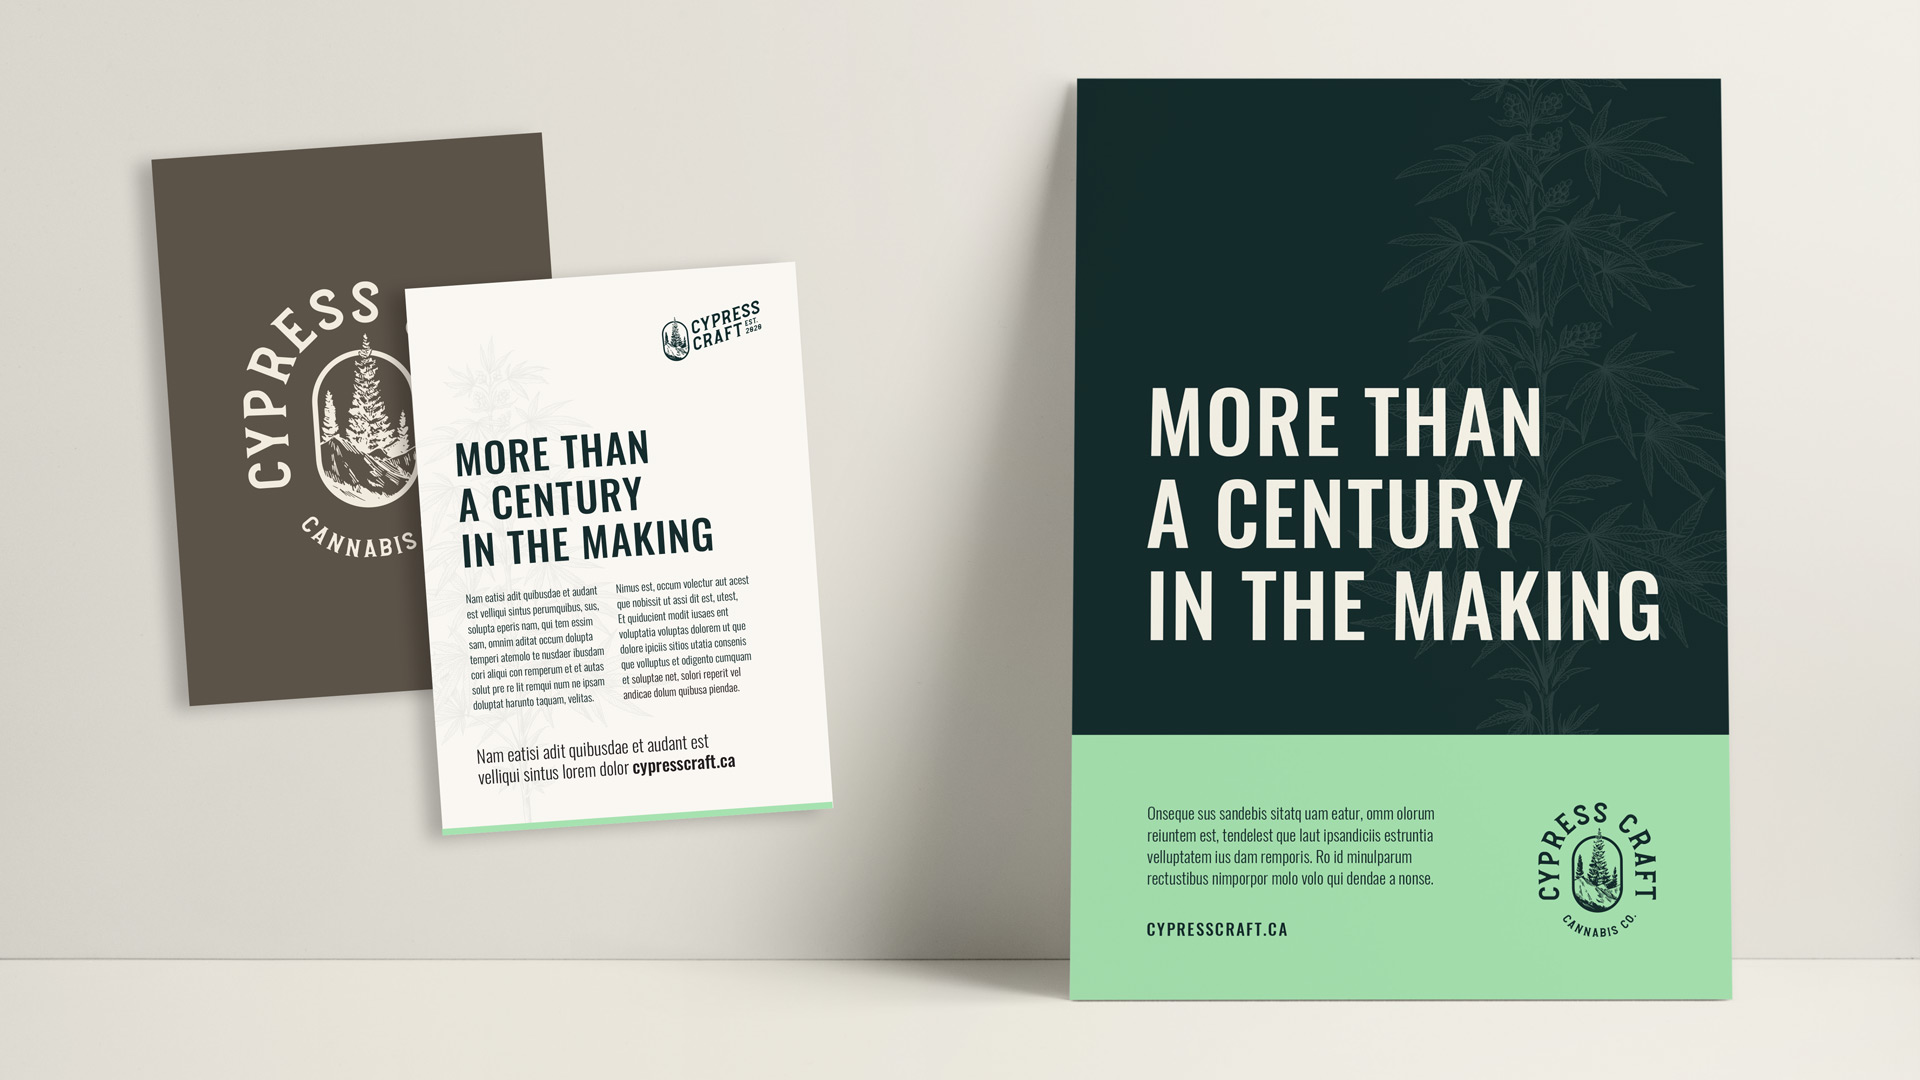 Cypress Craft informational handout